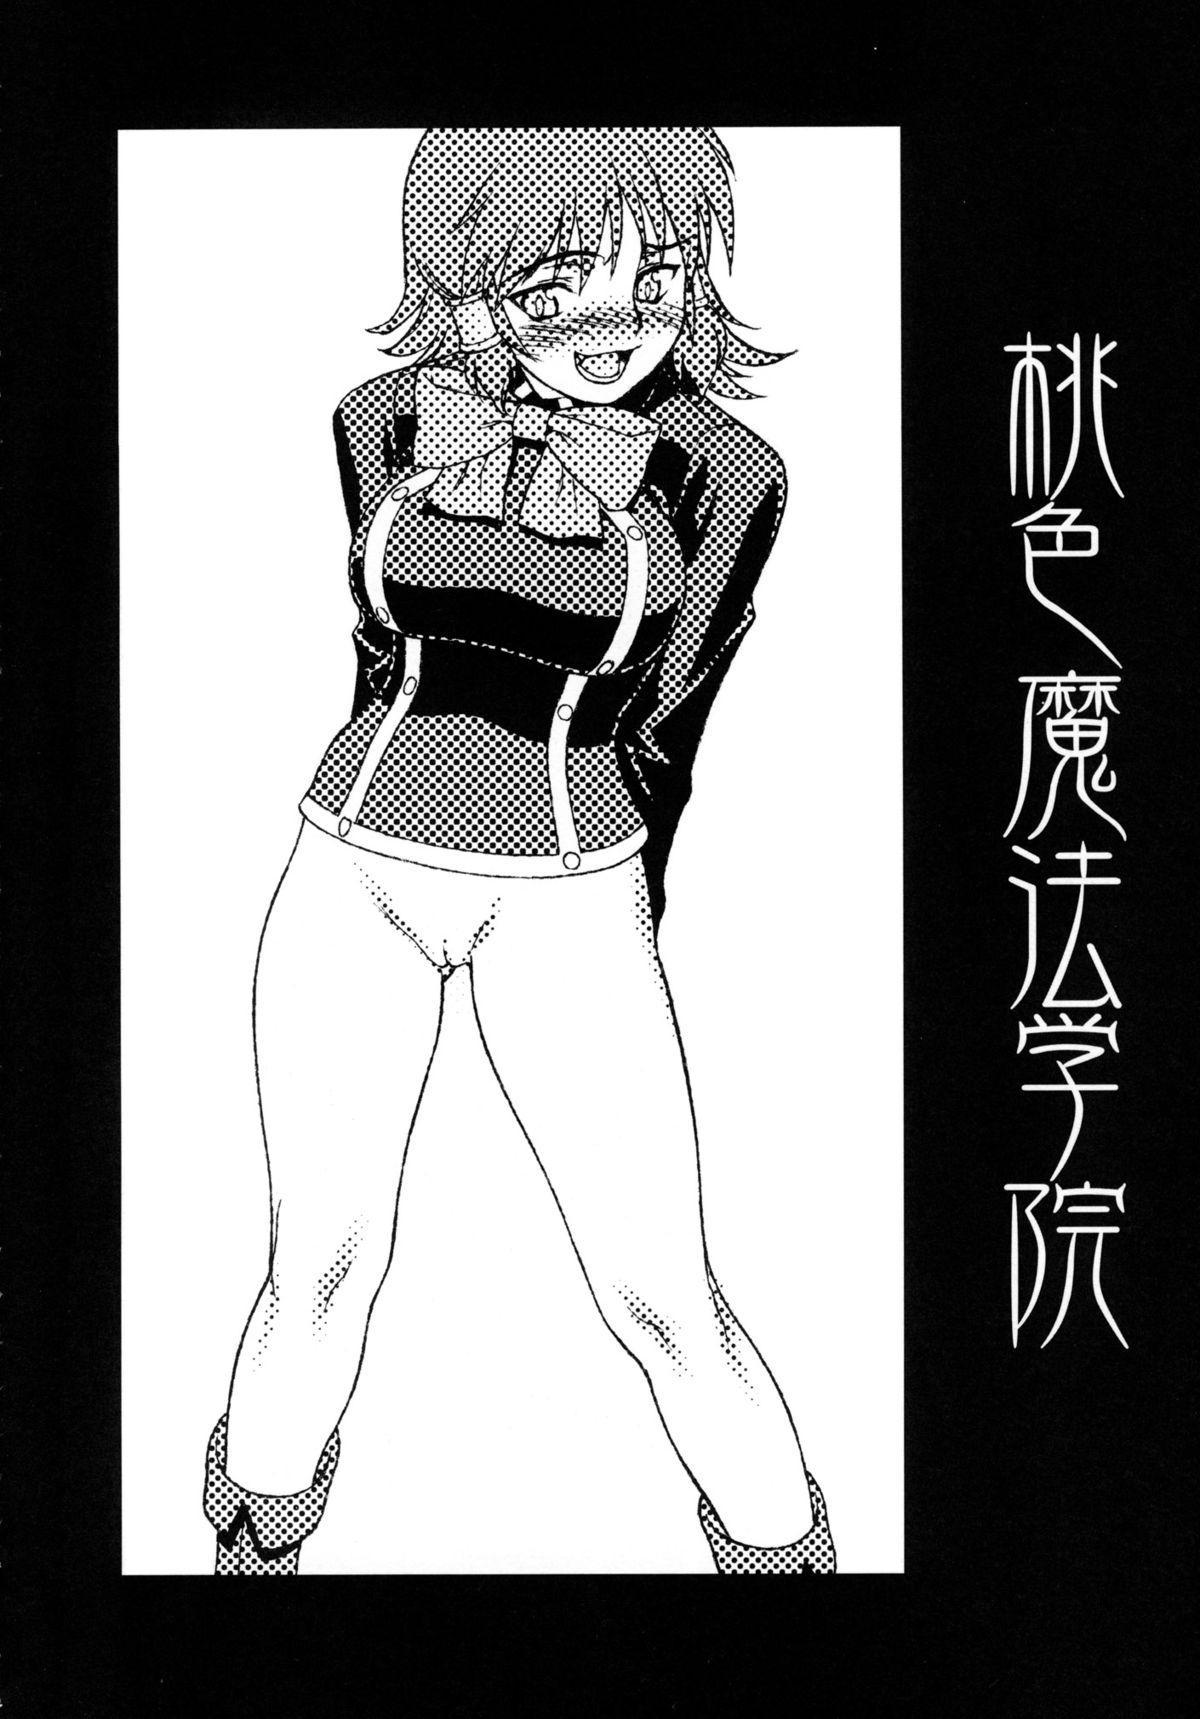 Momoiro! Mahou Gakuin 2